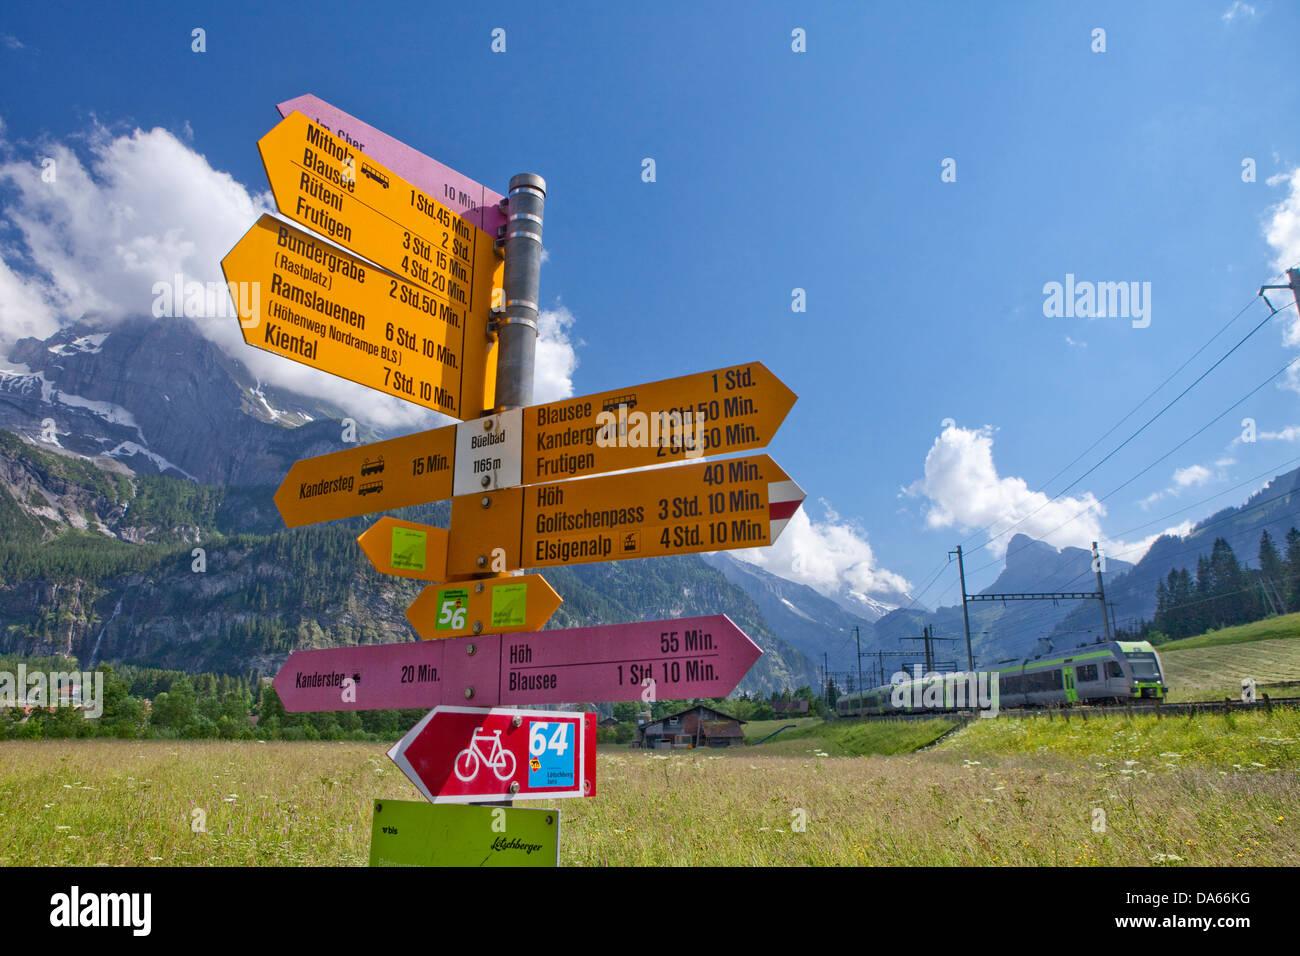 Zug, Kandersteg, BE, Straße, Bahn, Zug, Eisenbahn, Kanton Bern, Wanderweg, Lötschberg, BLS, Schweiz, Europa, Stockbild